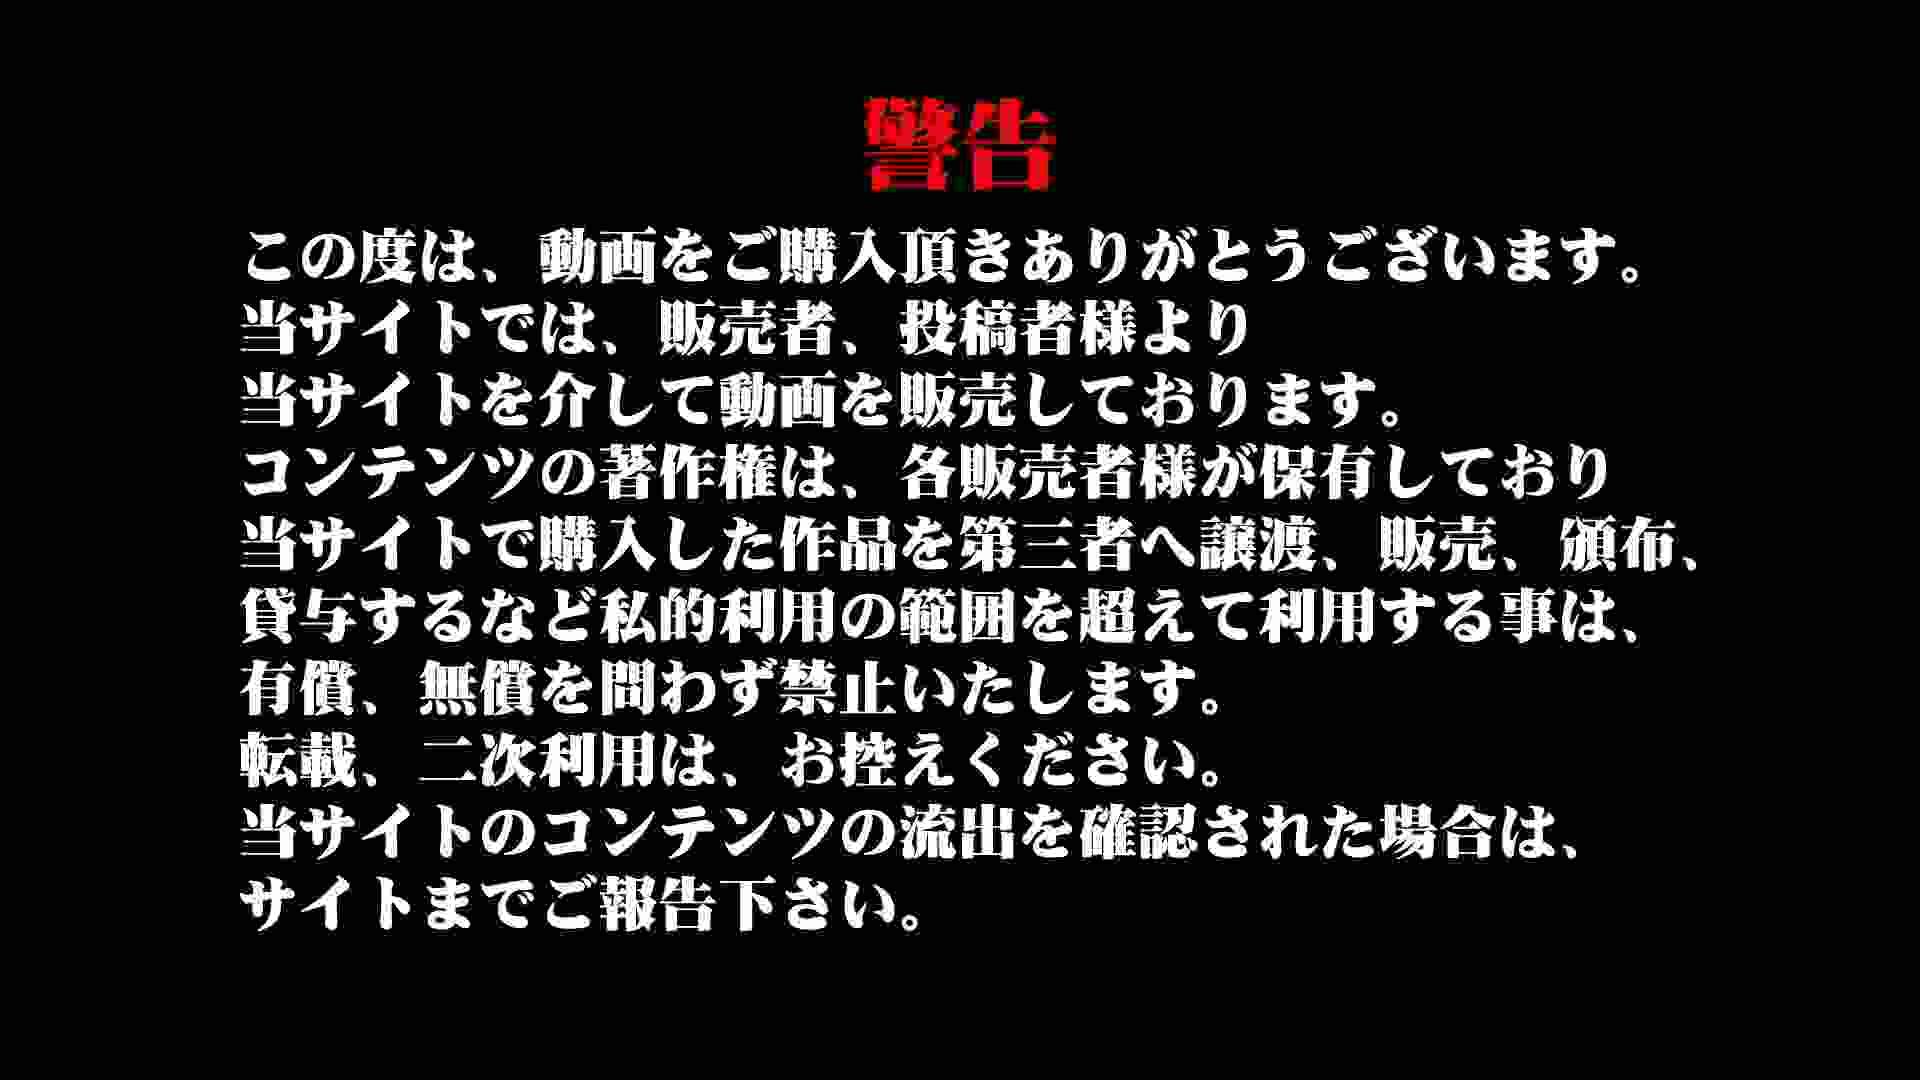 Aquaな露天風呂Vol.962 エッチな盗撮 われめAV動画紹介 94pic 2